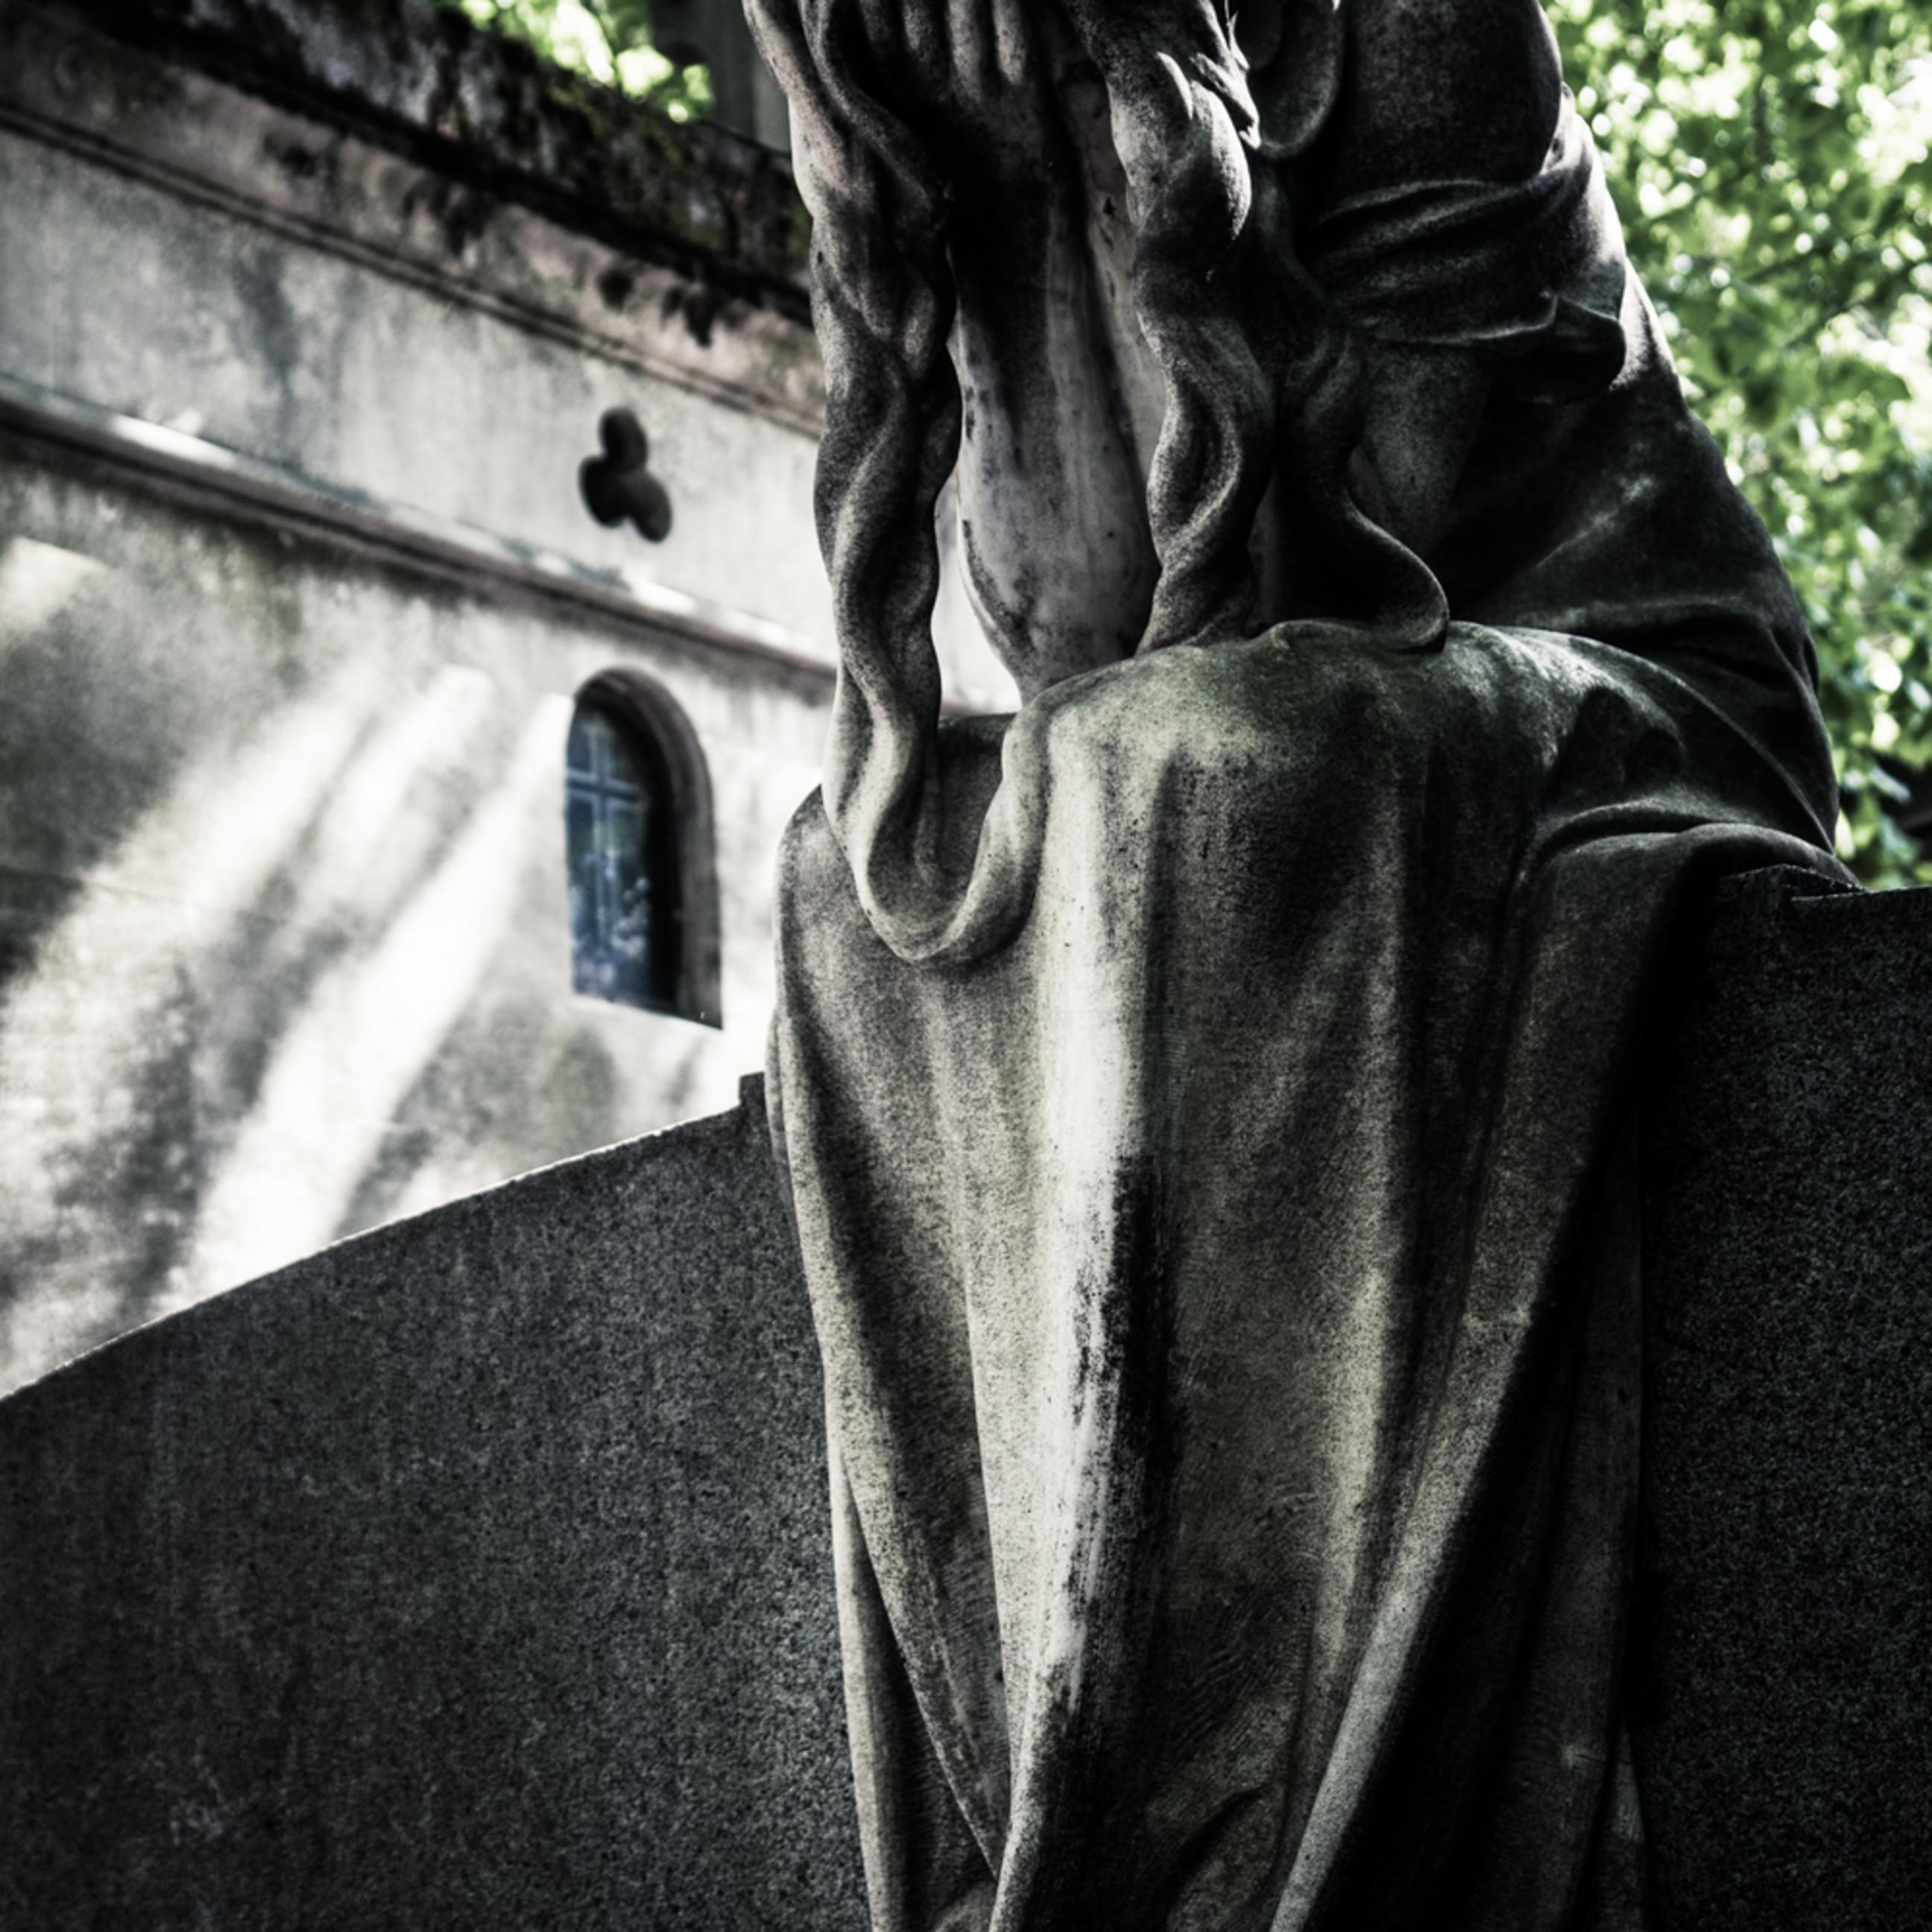 Crying tomb dsc02794 lg i6tnhg